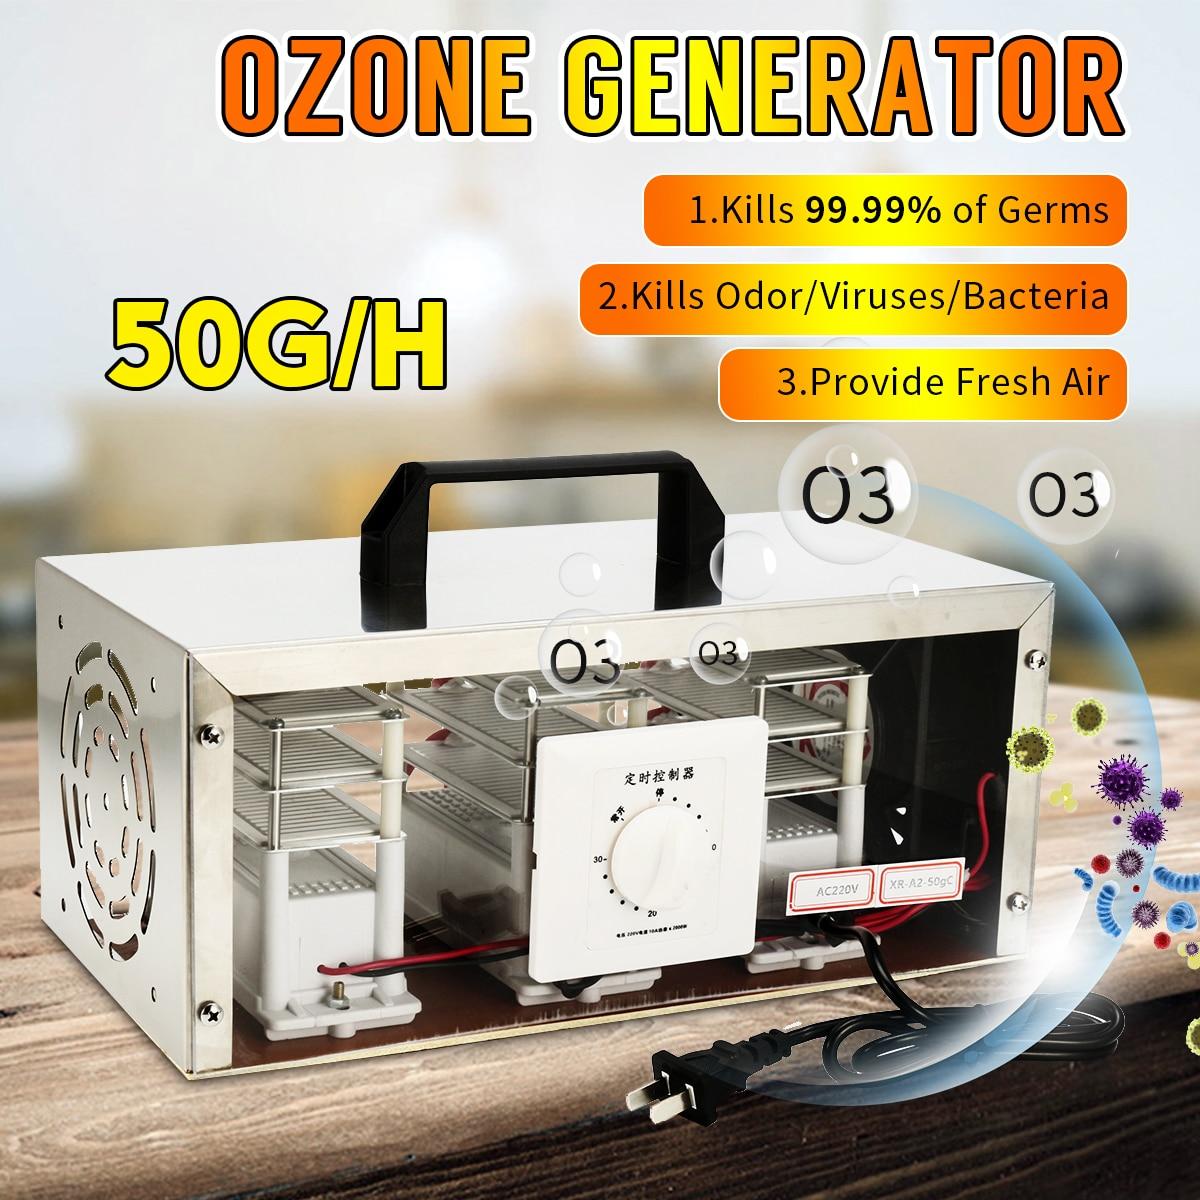 30g 50g/h 110V 220V Air Ozone Generator Air Purifier Sterilizer Ozonator Portable Ozonizer Cleaner Sterilizer With Timing Switch